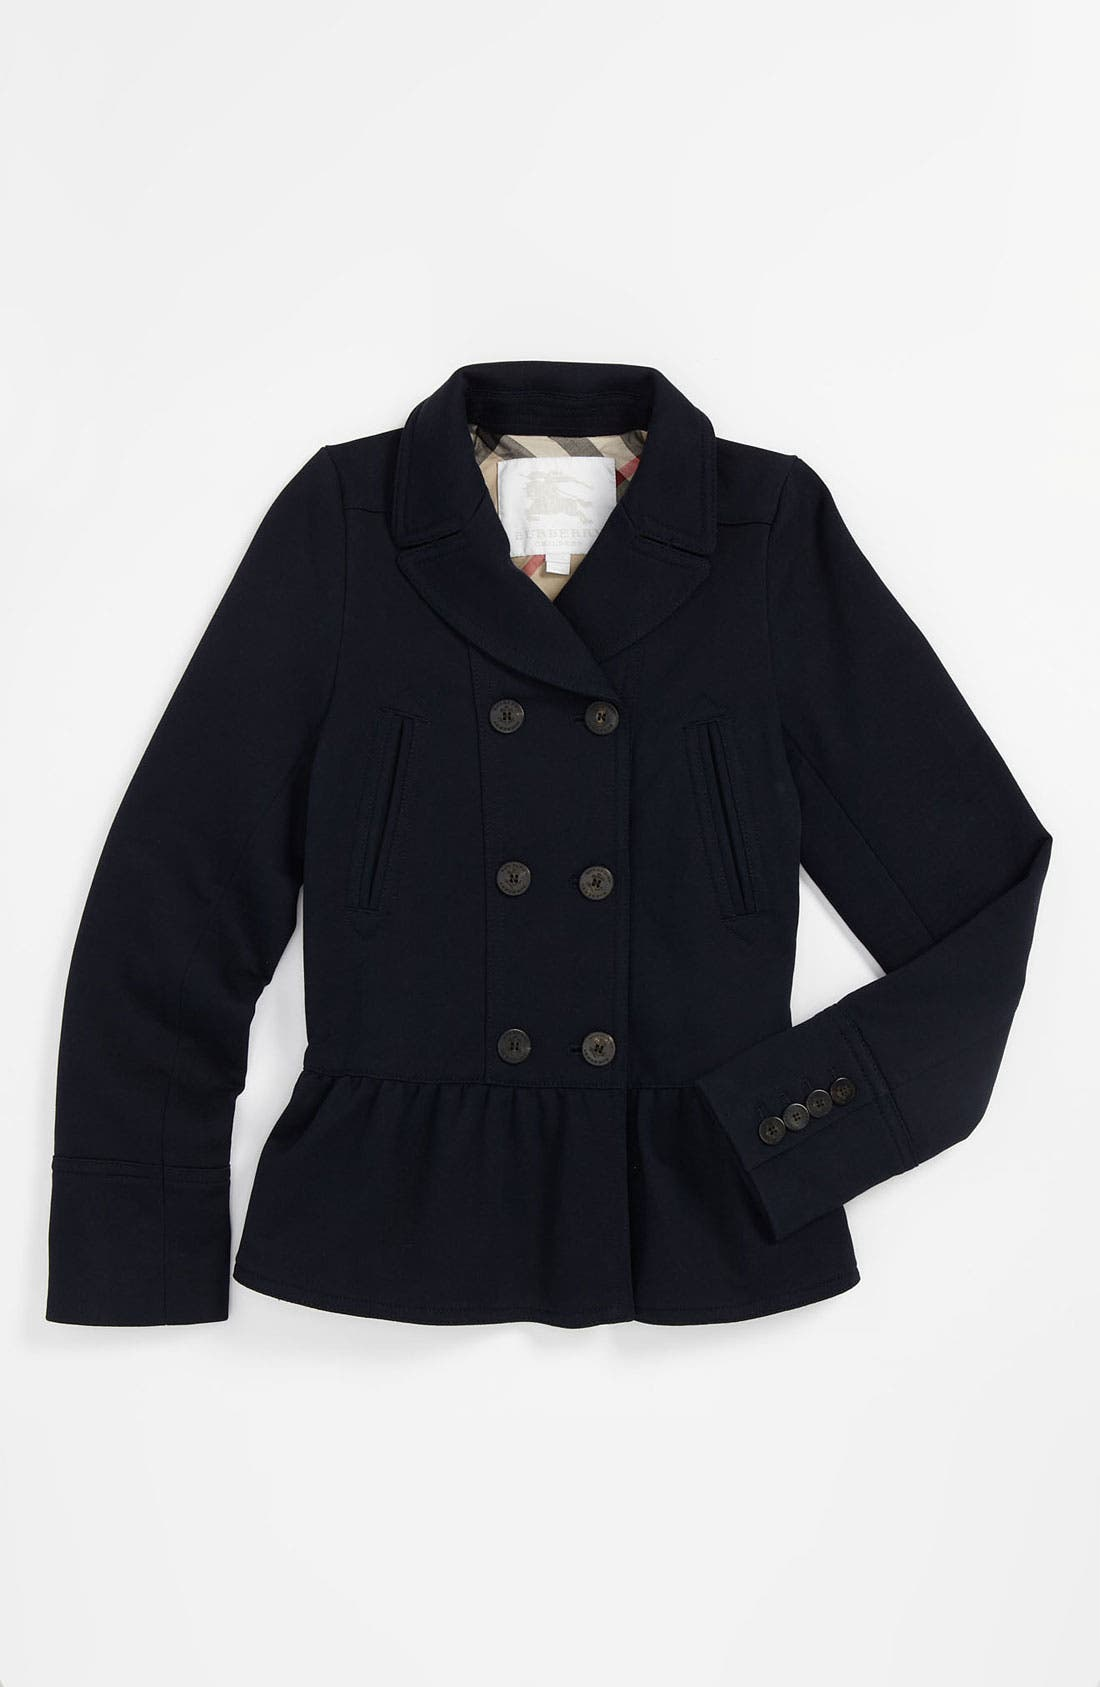 Main Image - Burberry 'Janetta' Knit Jacket (Little Girls & Big Girls)